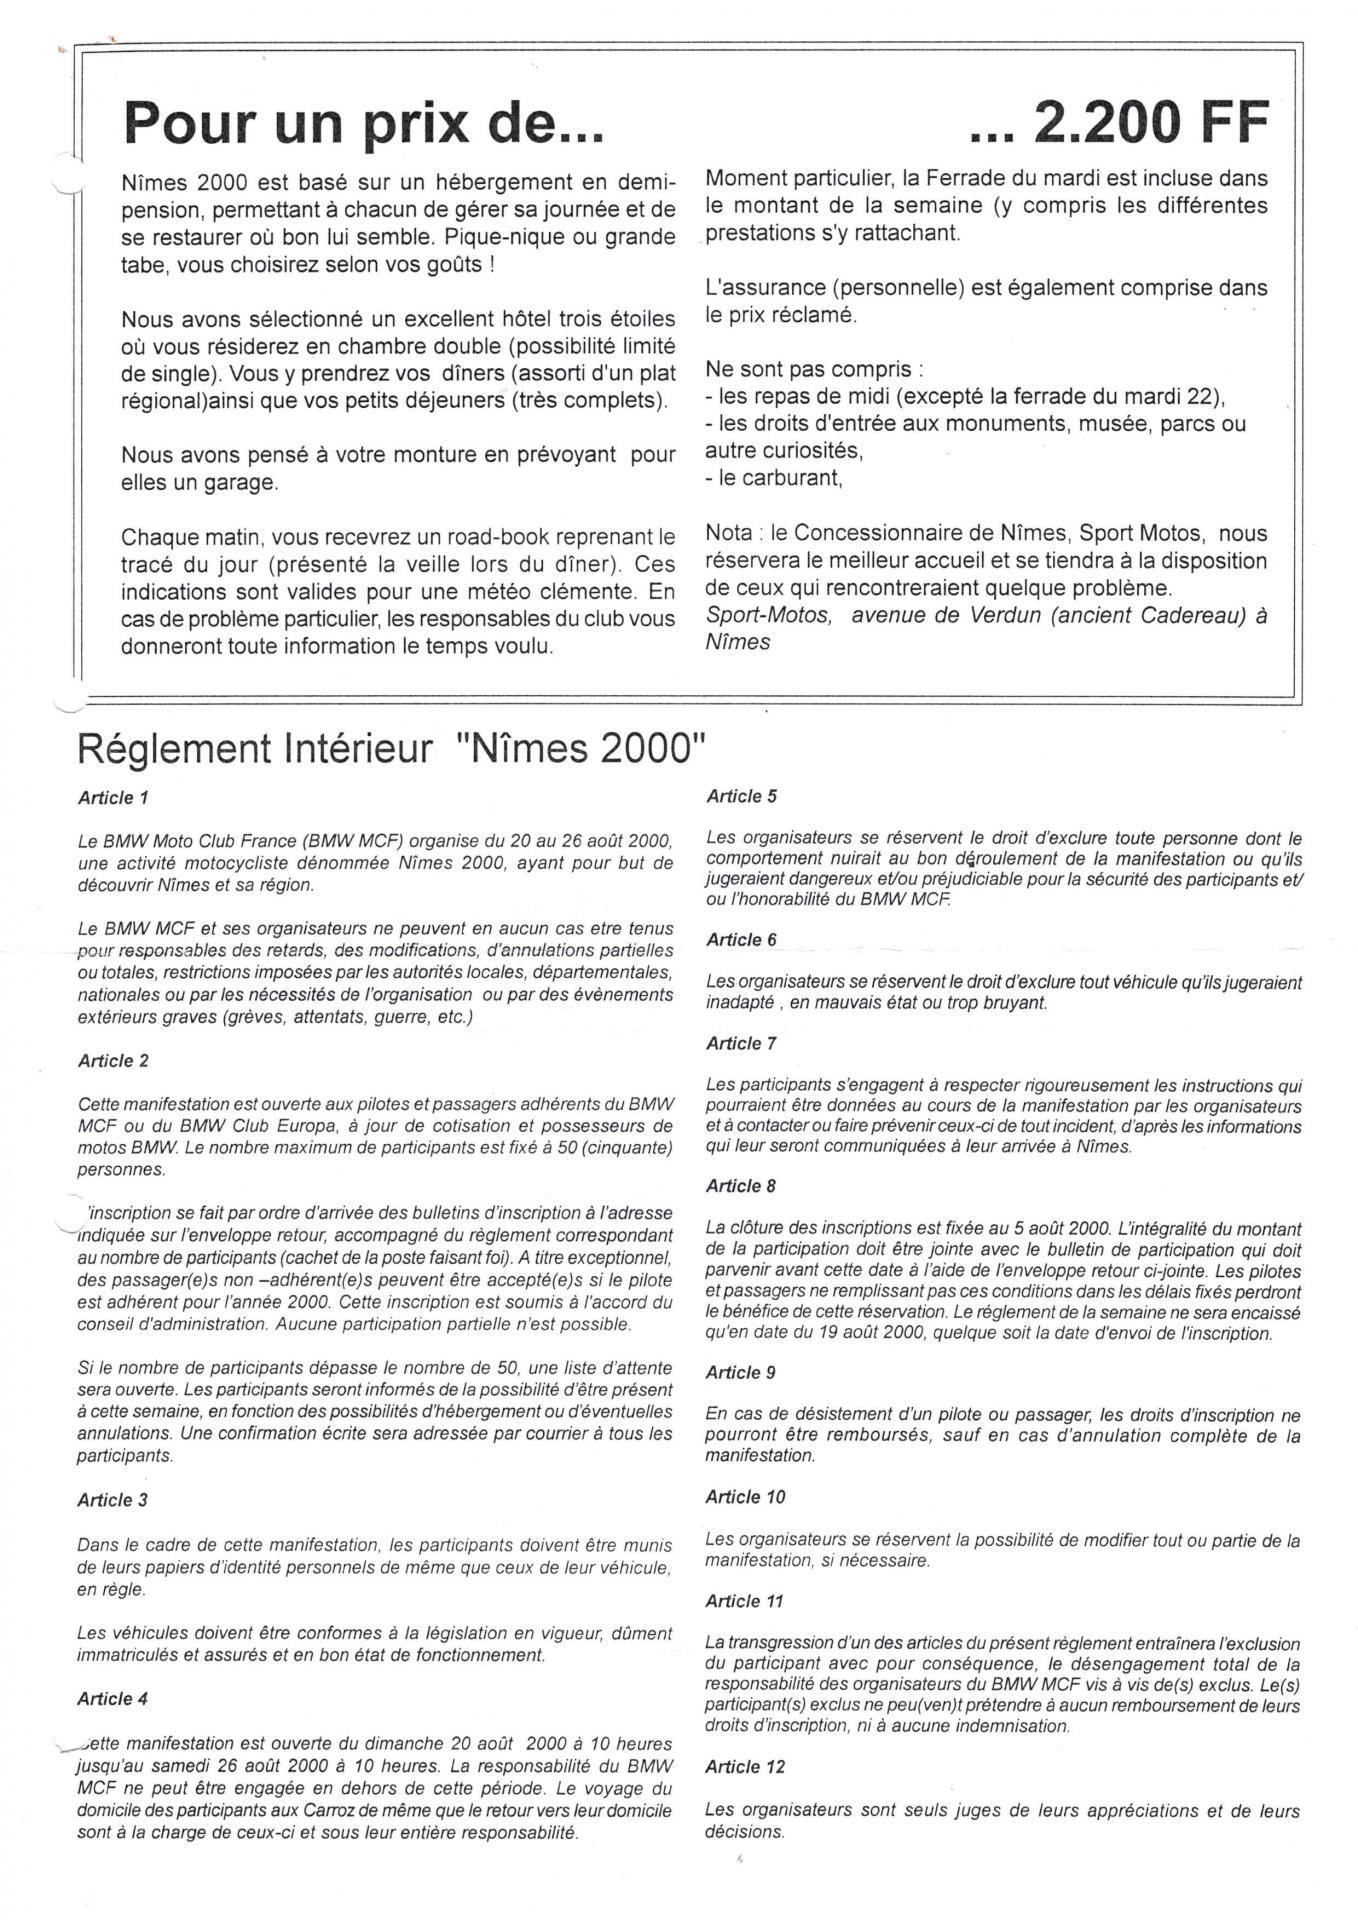 2000 07 nimes express 3